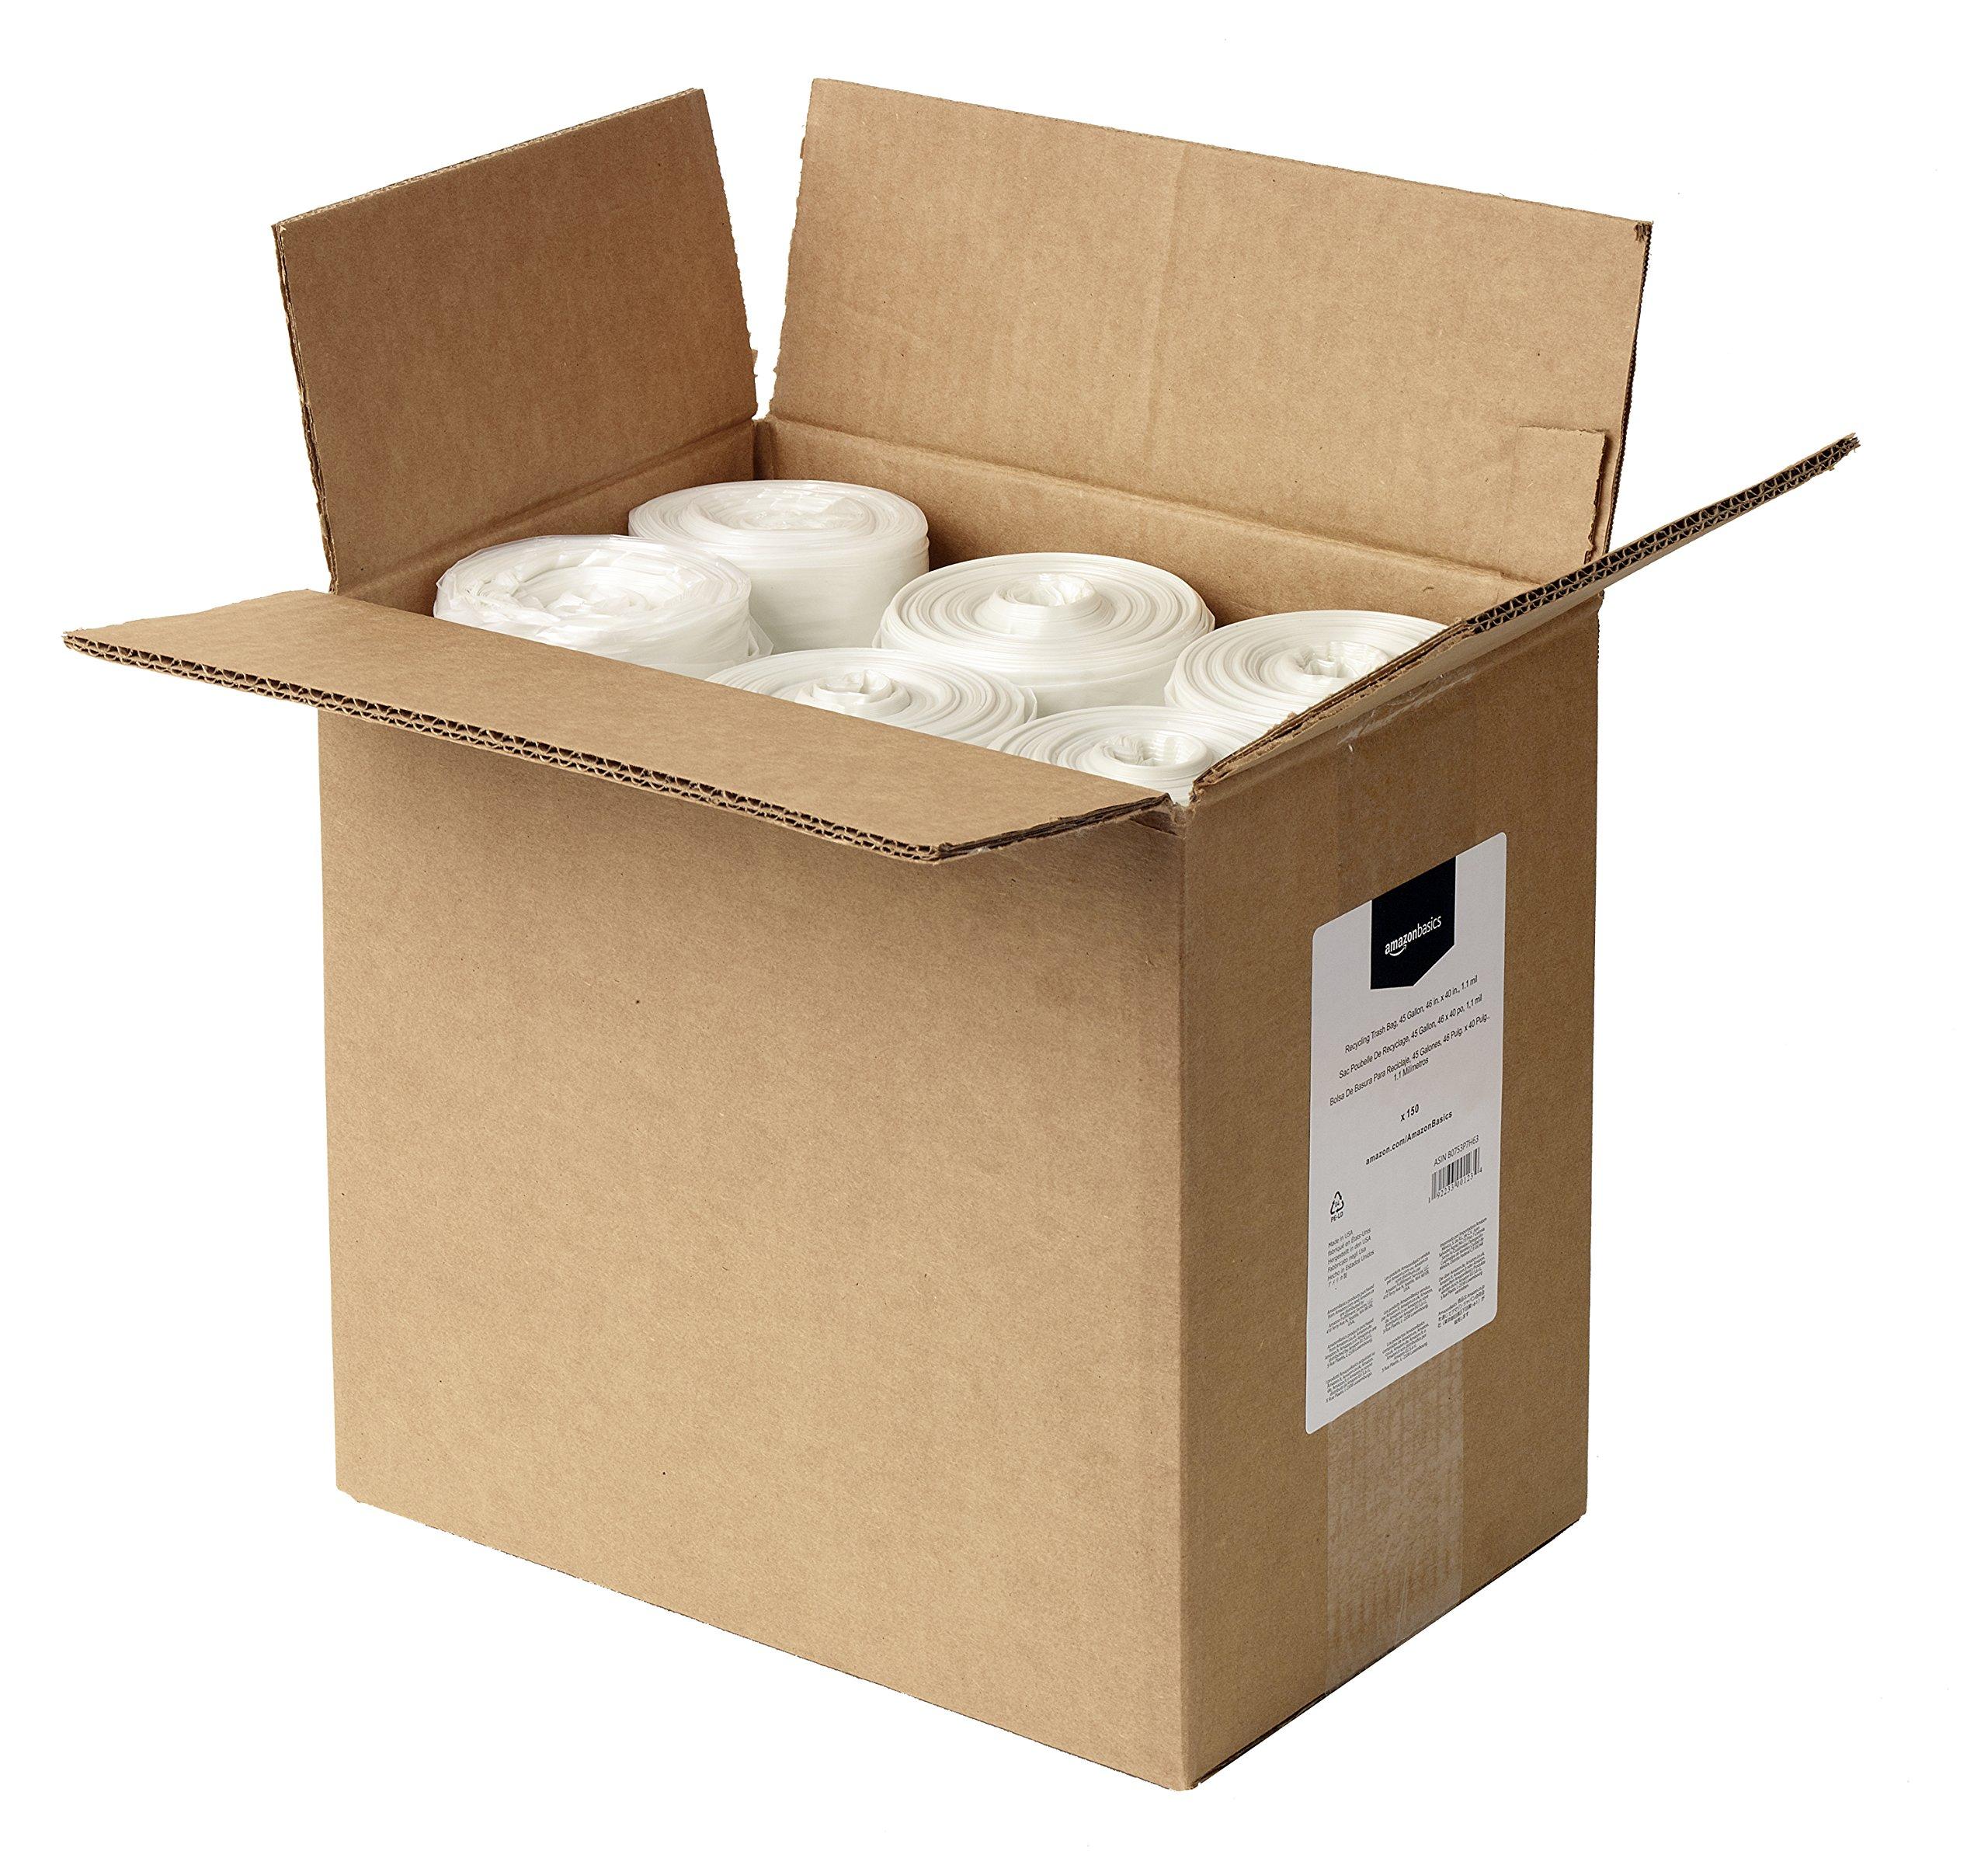 AmazonBasics 45 Gallon Recycling Trash Bag, 1.1 mil, Clear, 150-Count by AmazonBasics (Image #3)